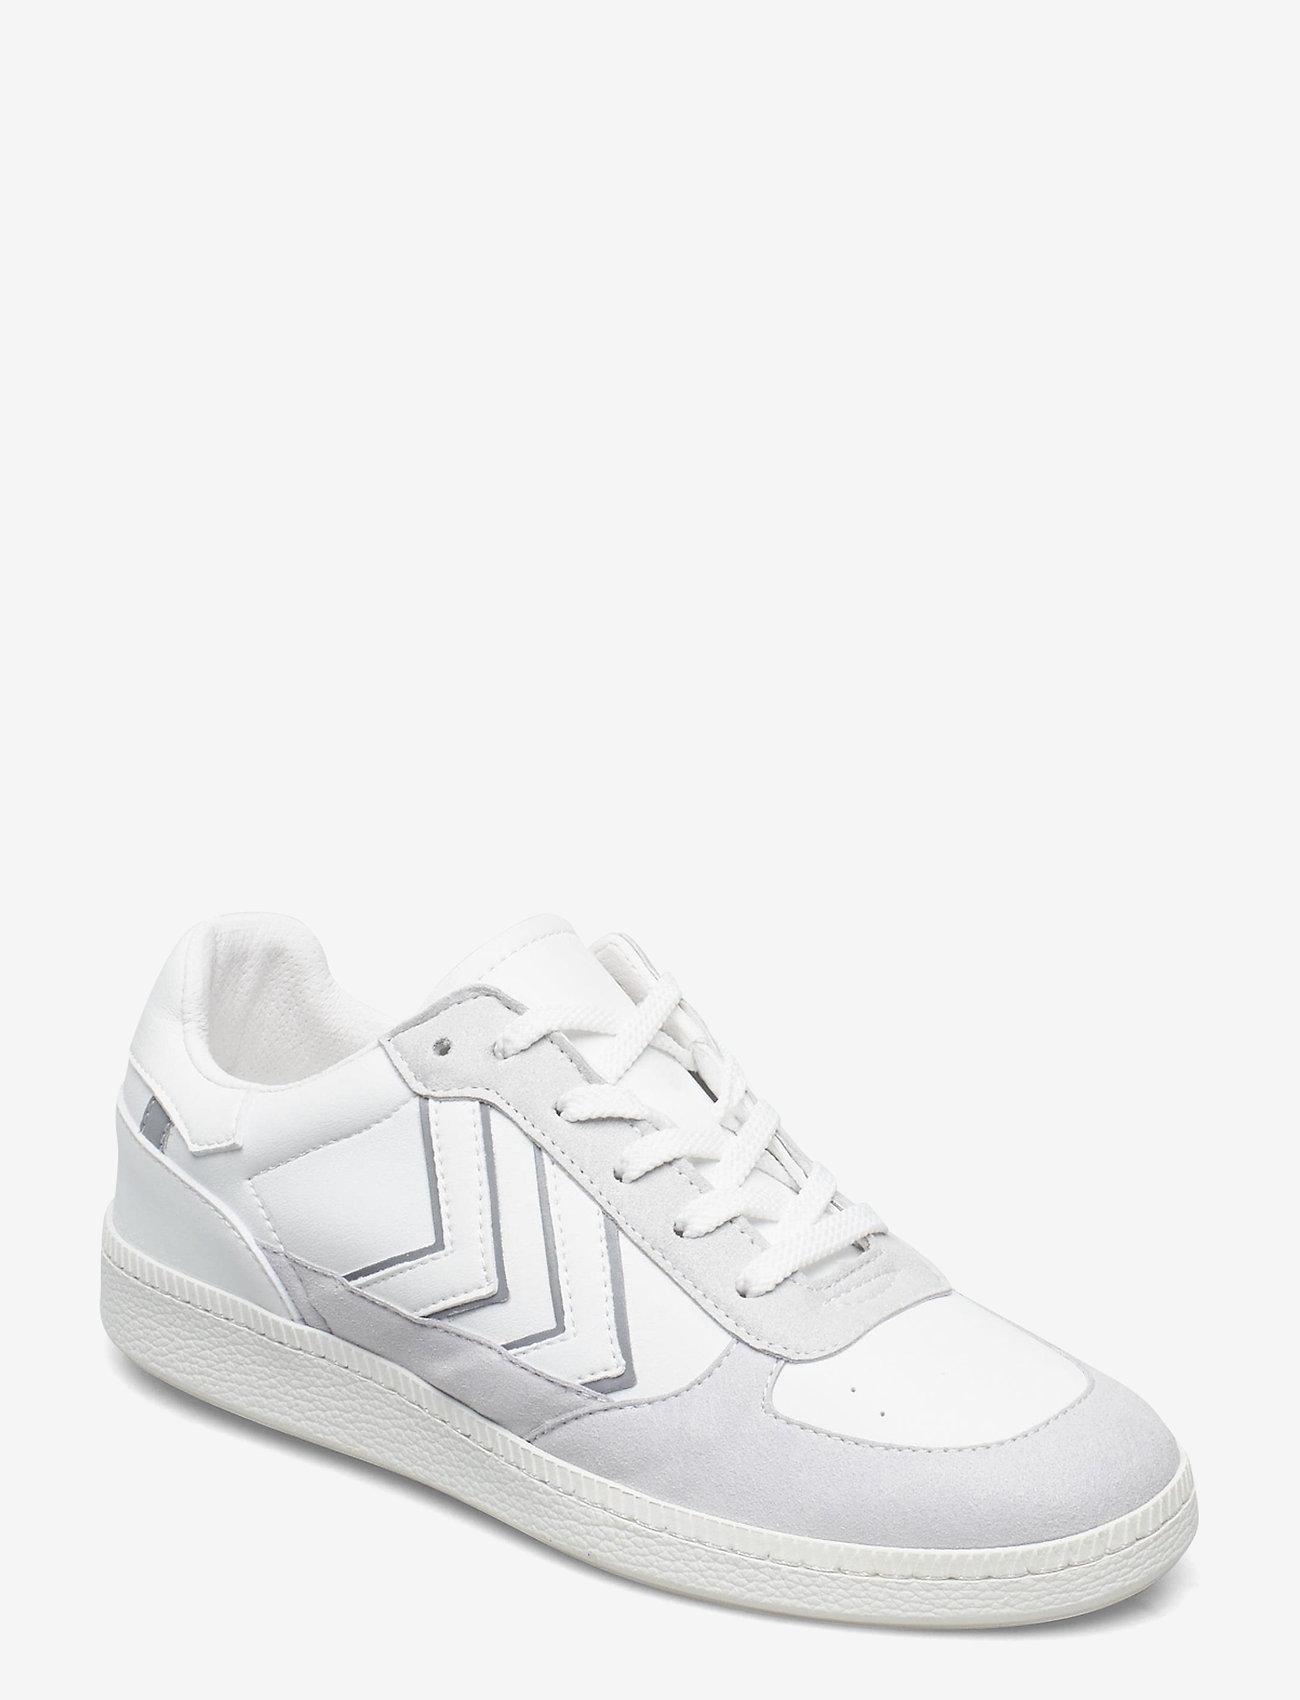 Hummel - VICTORY PREMIUM - laag sneakers - white - 0